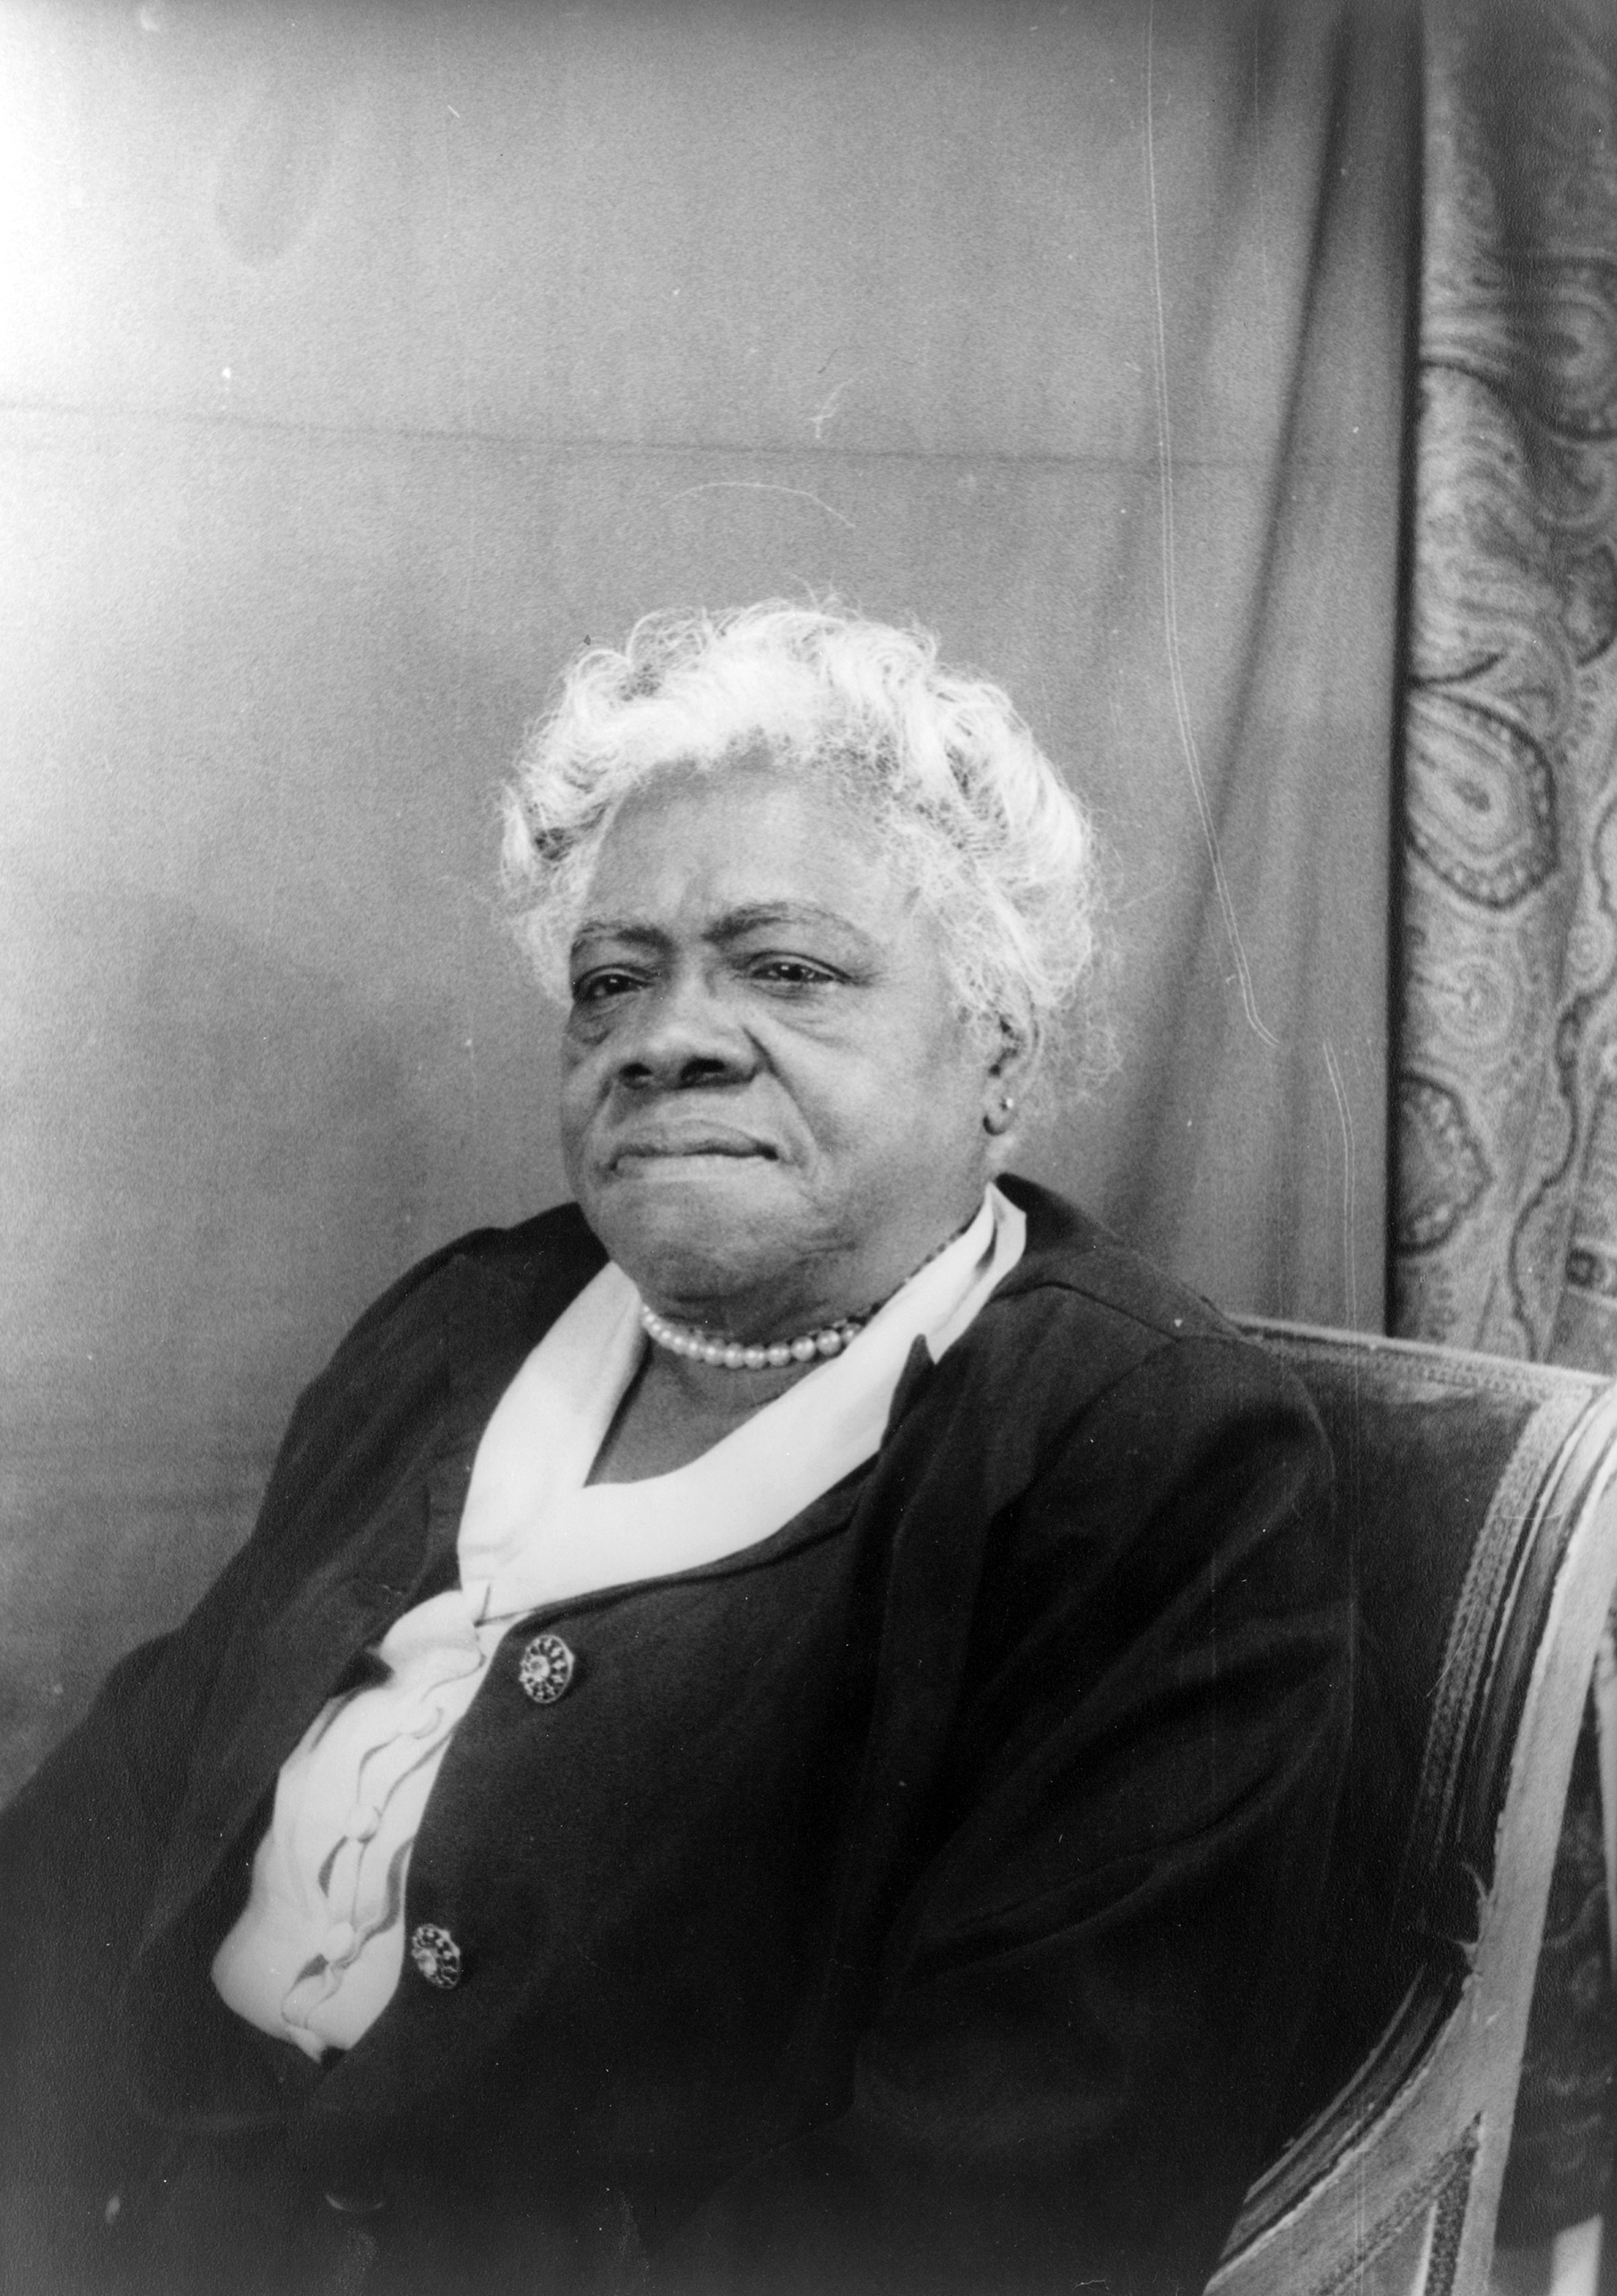 Mary McLeod Bethune, April 6, 1949.